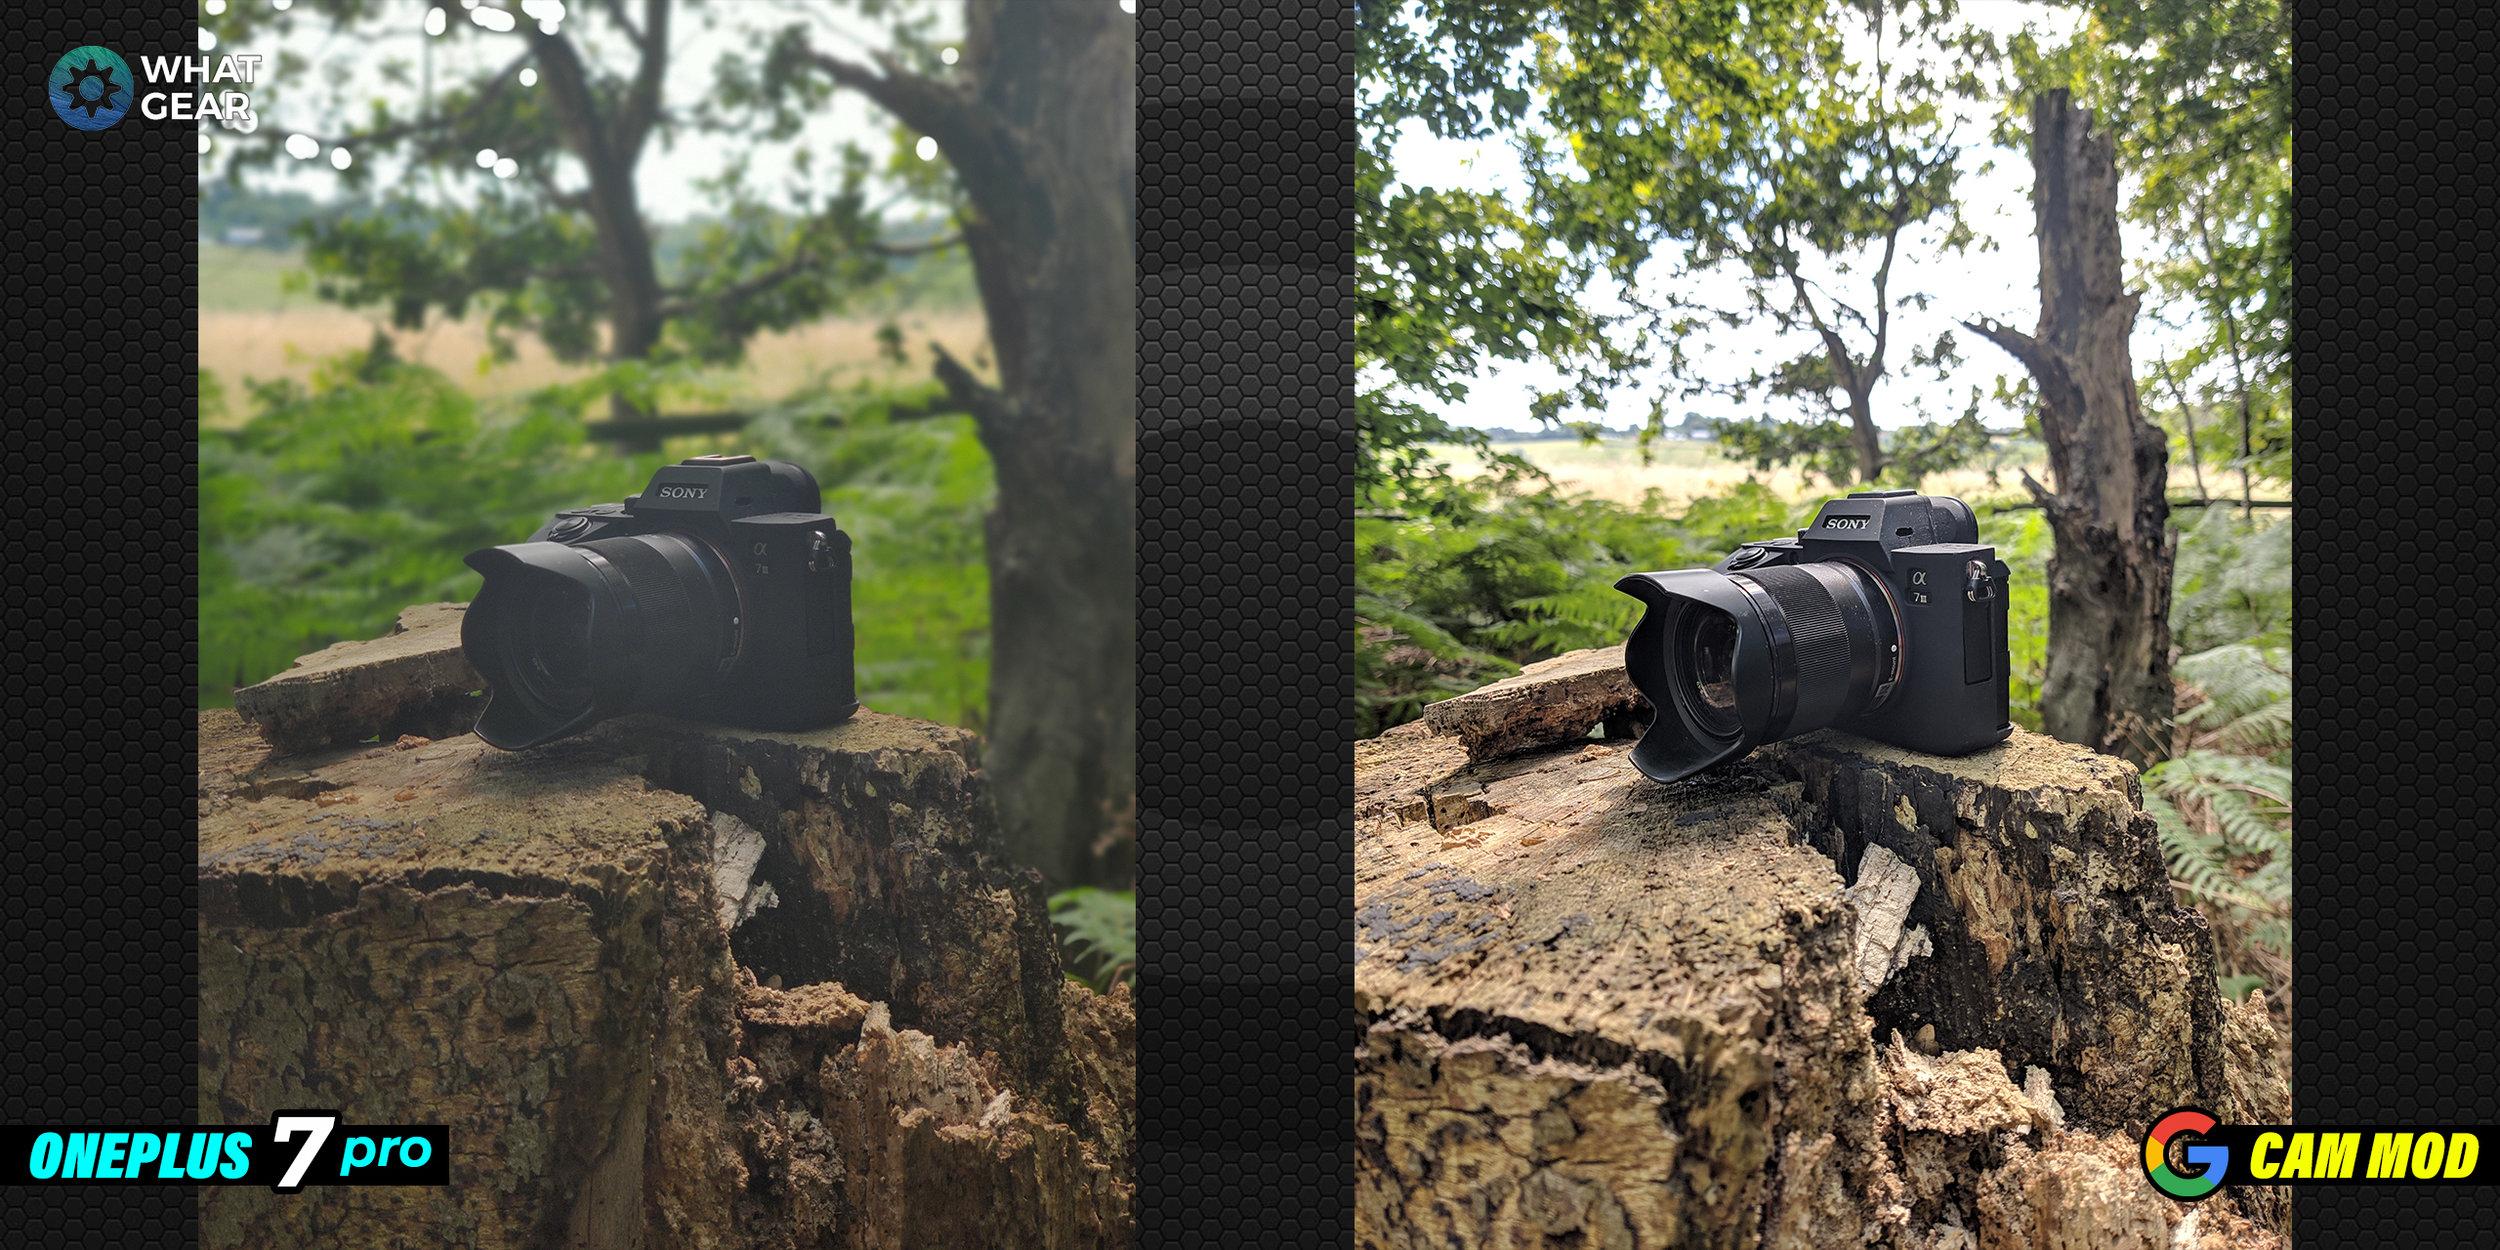 Oneplus 7 Pro Google Camera Vs Stock Camera Whatgear Net